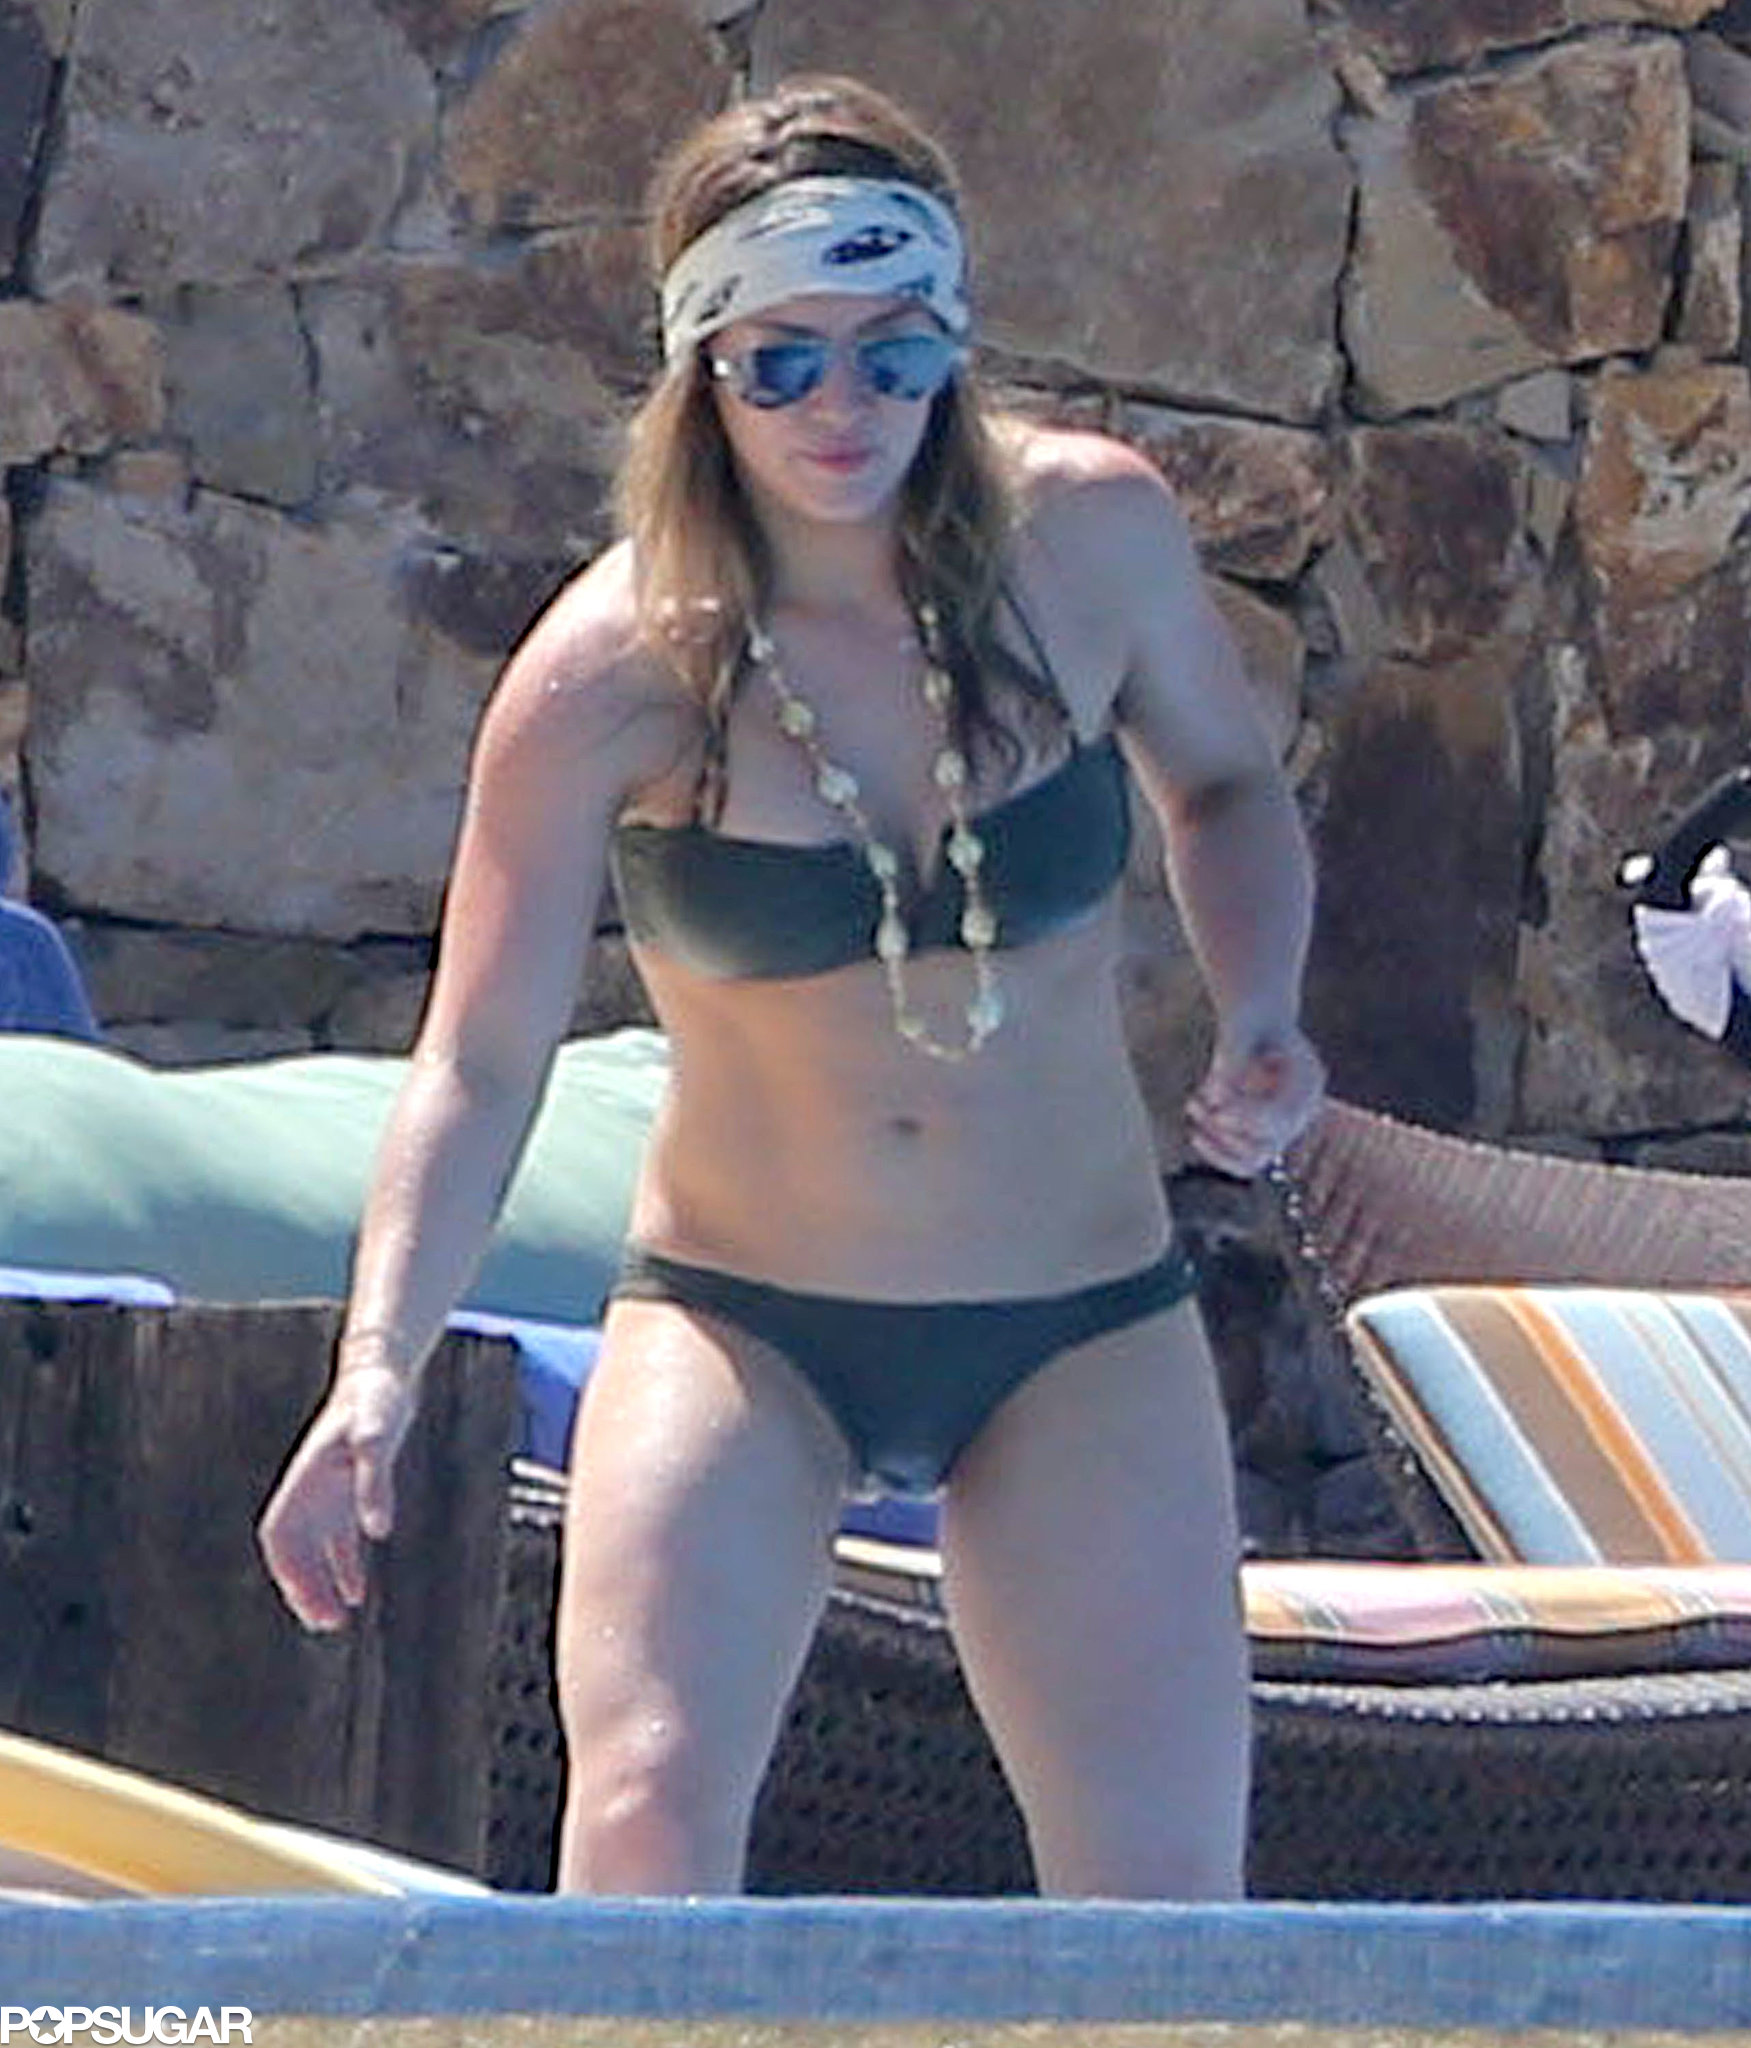 Hilary Duff wore a tiny bikini by the pool.